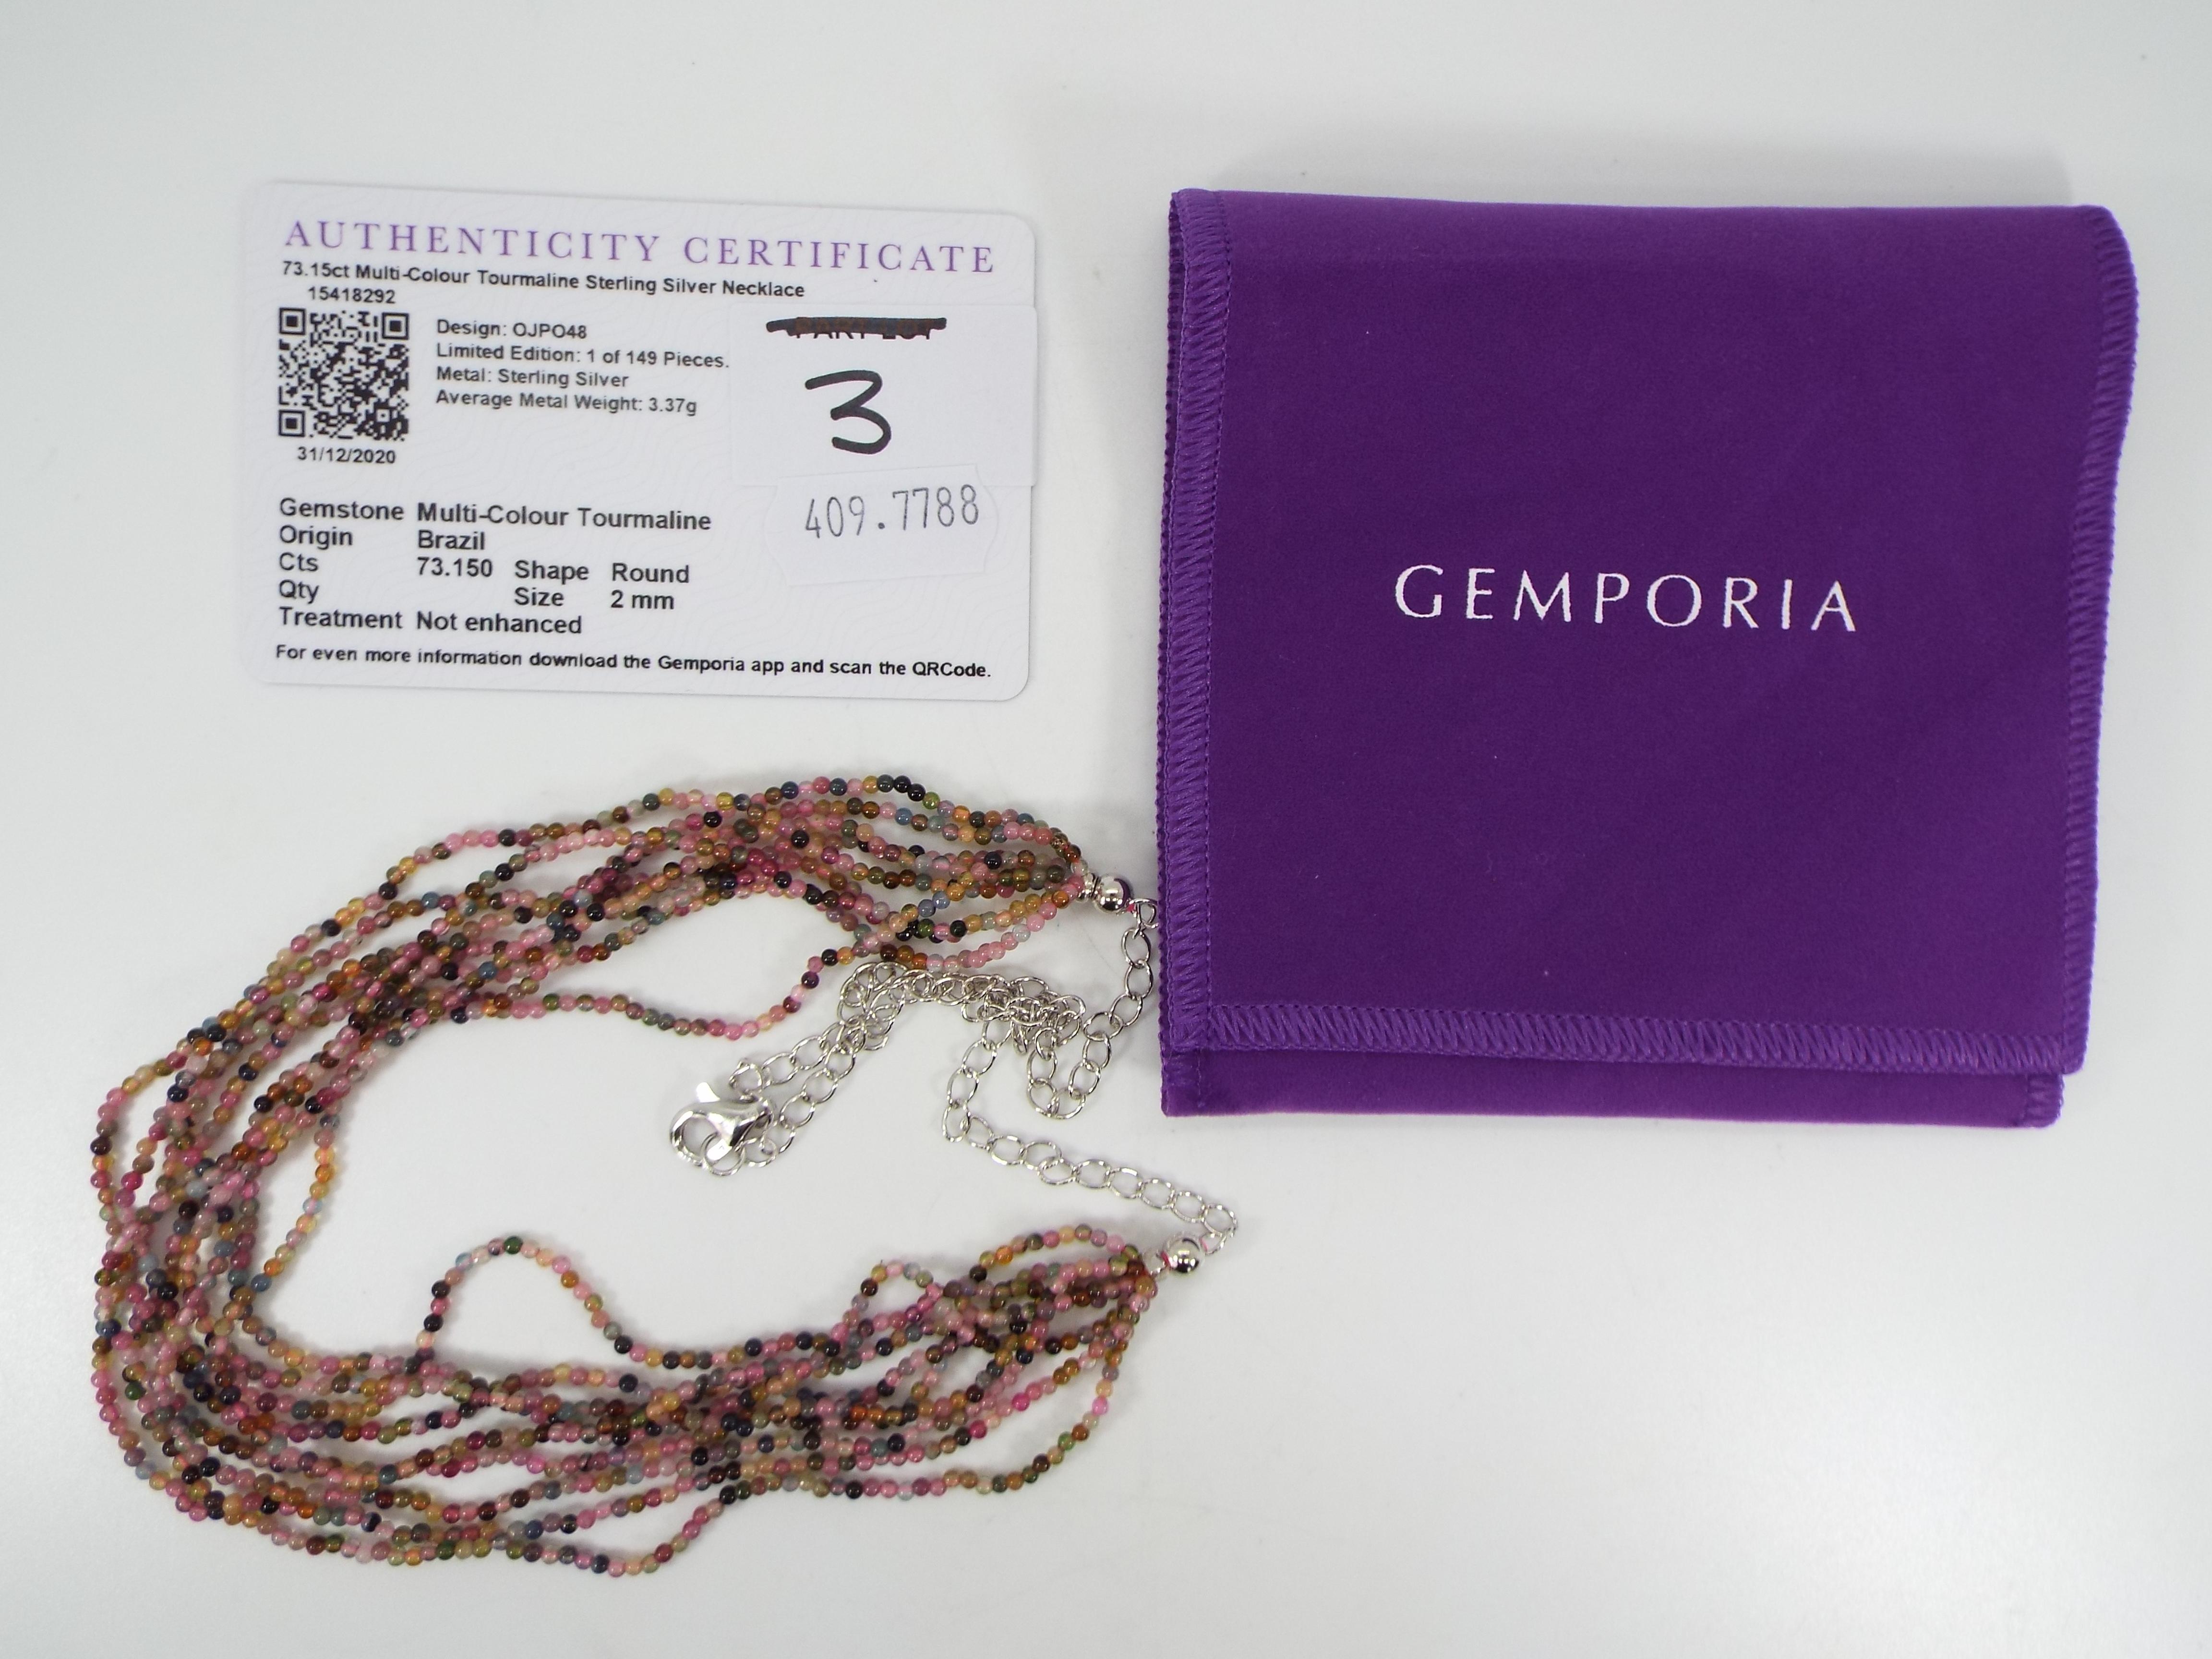 Gemporia - A 73.15 ct multi-colour Tourm - Image 5 of 5